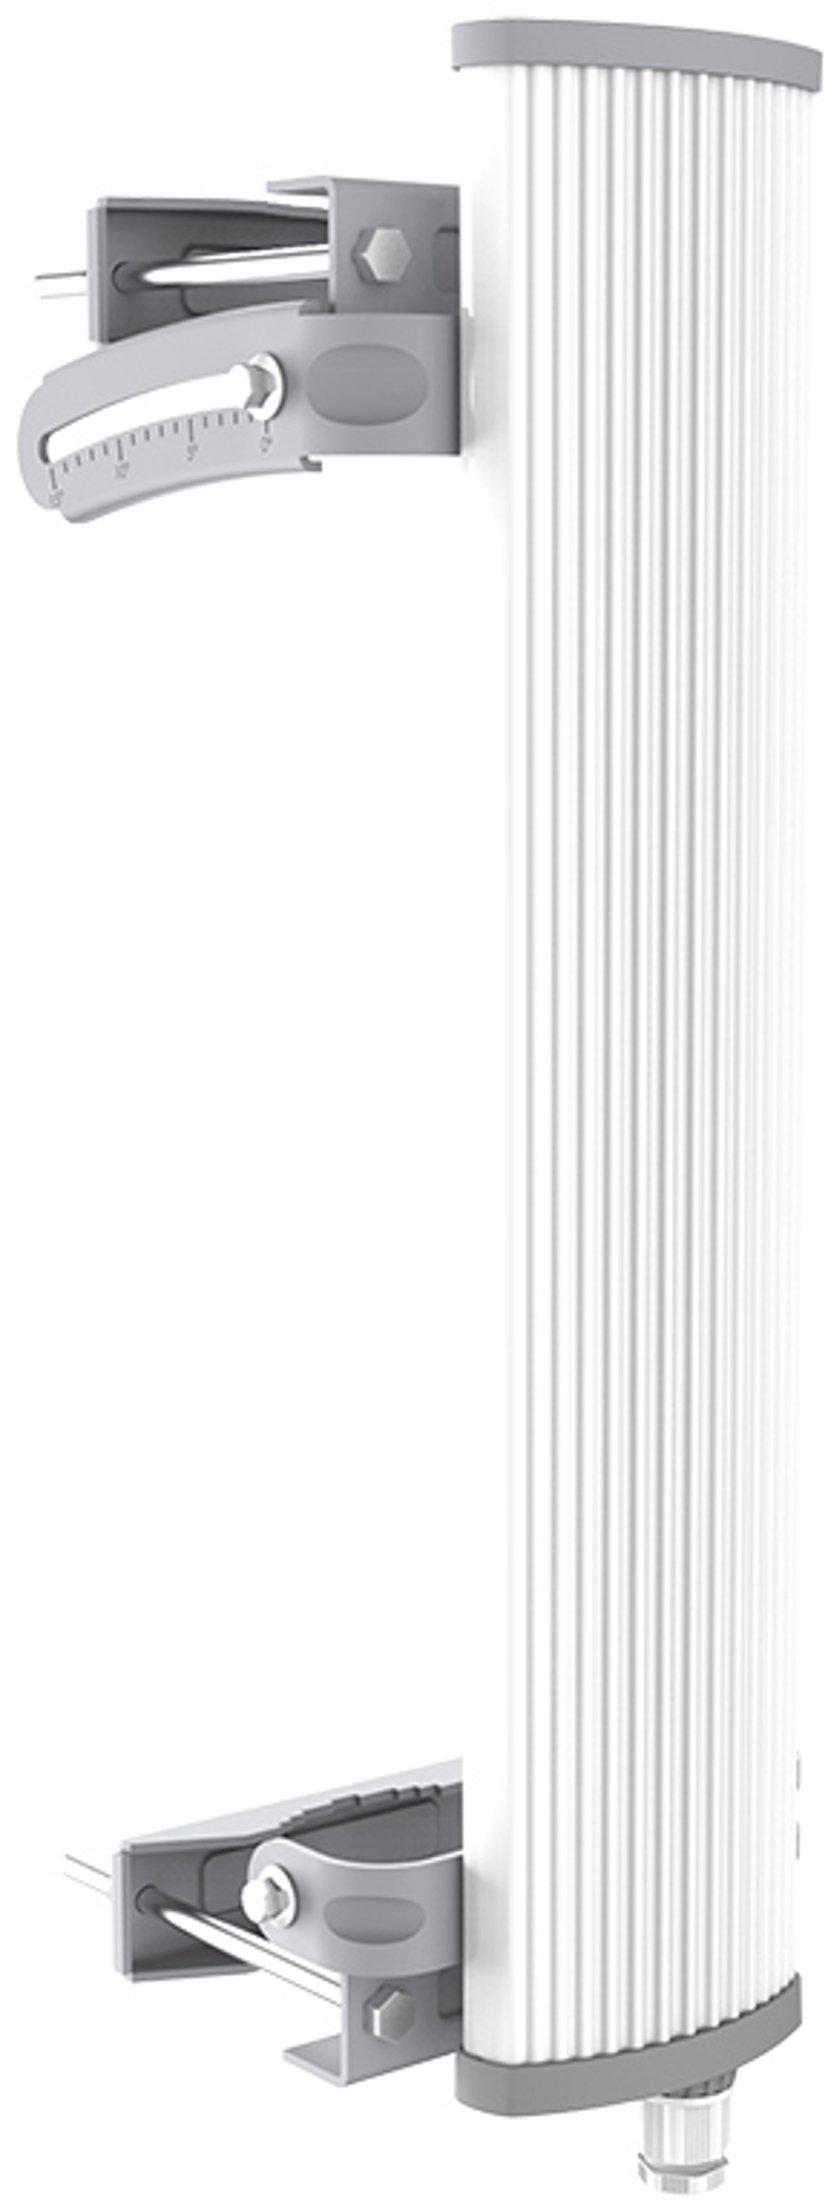 Ligowave LigoDLB 5-90-17ac PRO Point-to-Multipoint